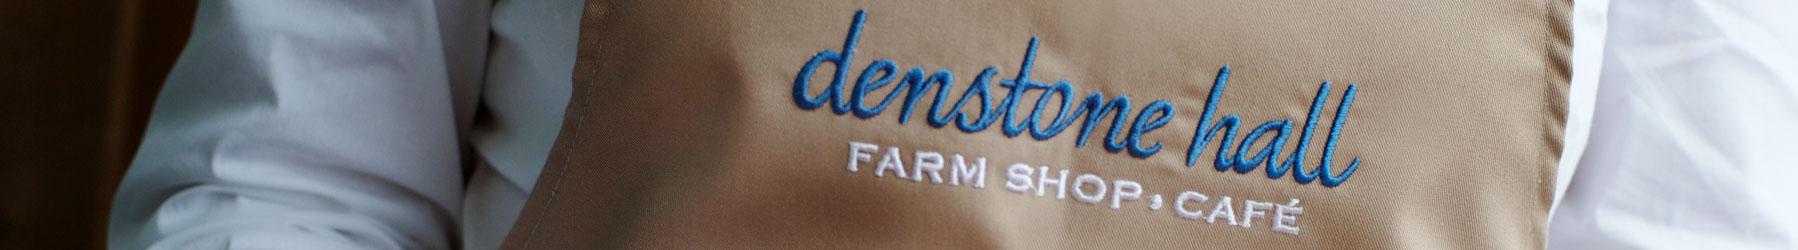 denstone-cafe-staff